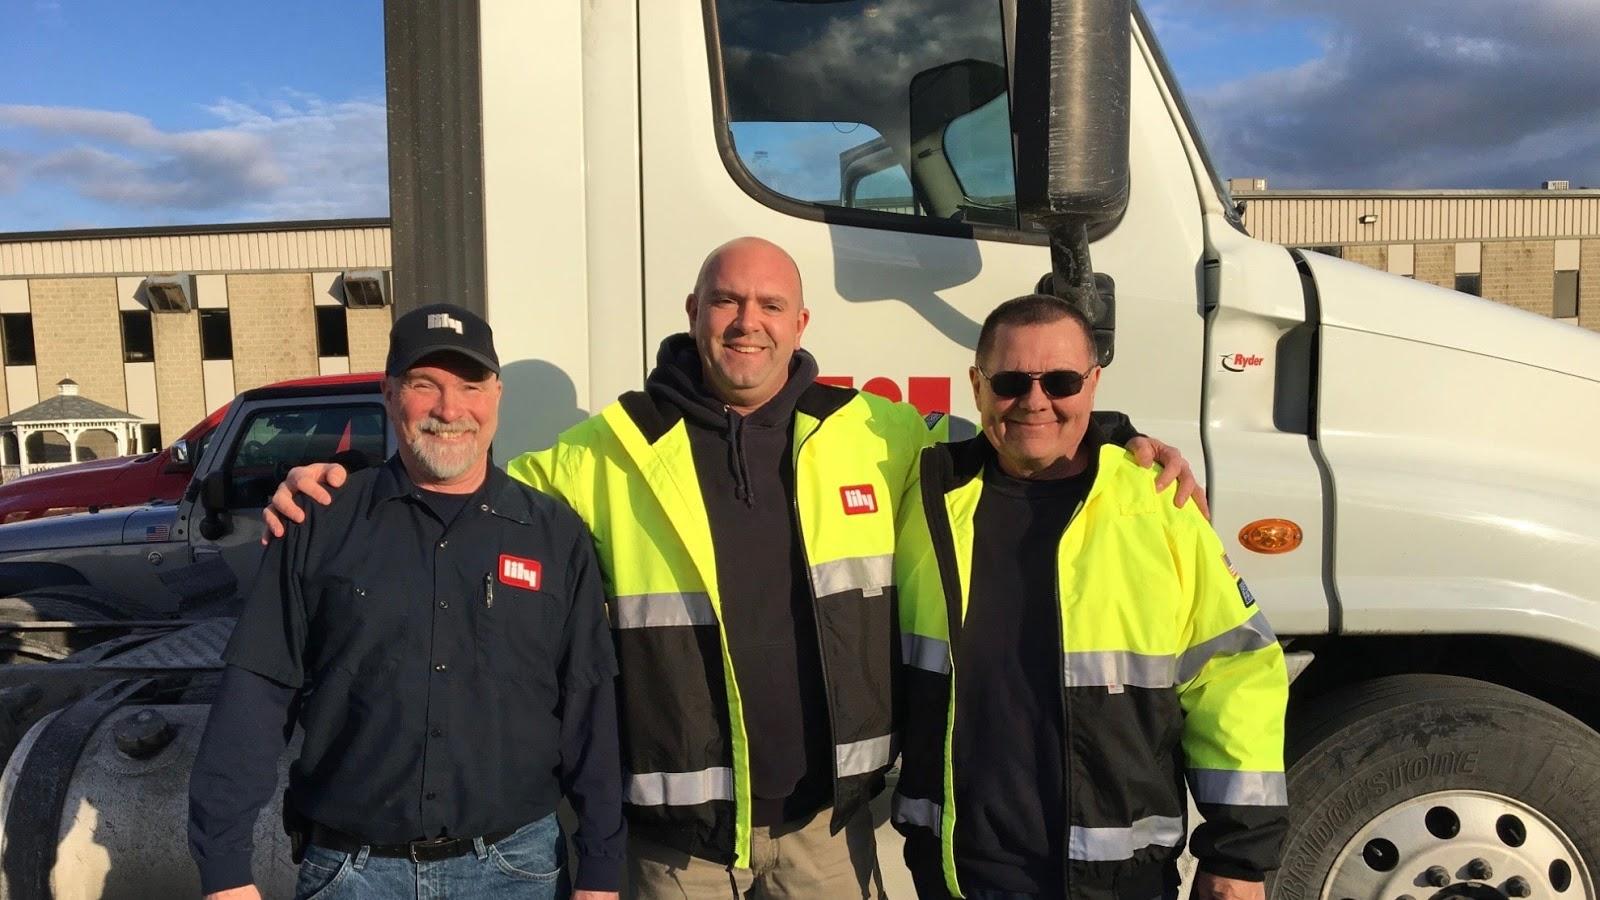 OTR trucking - Lily drivers